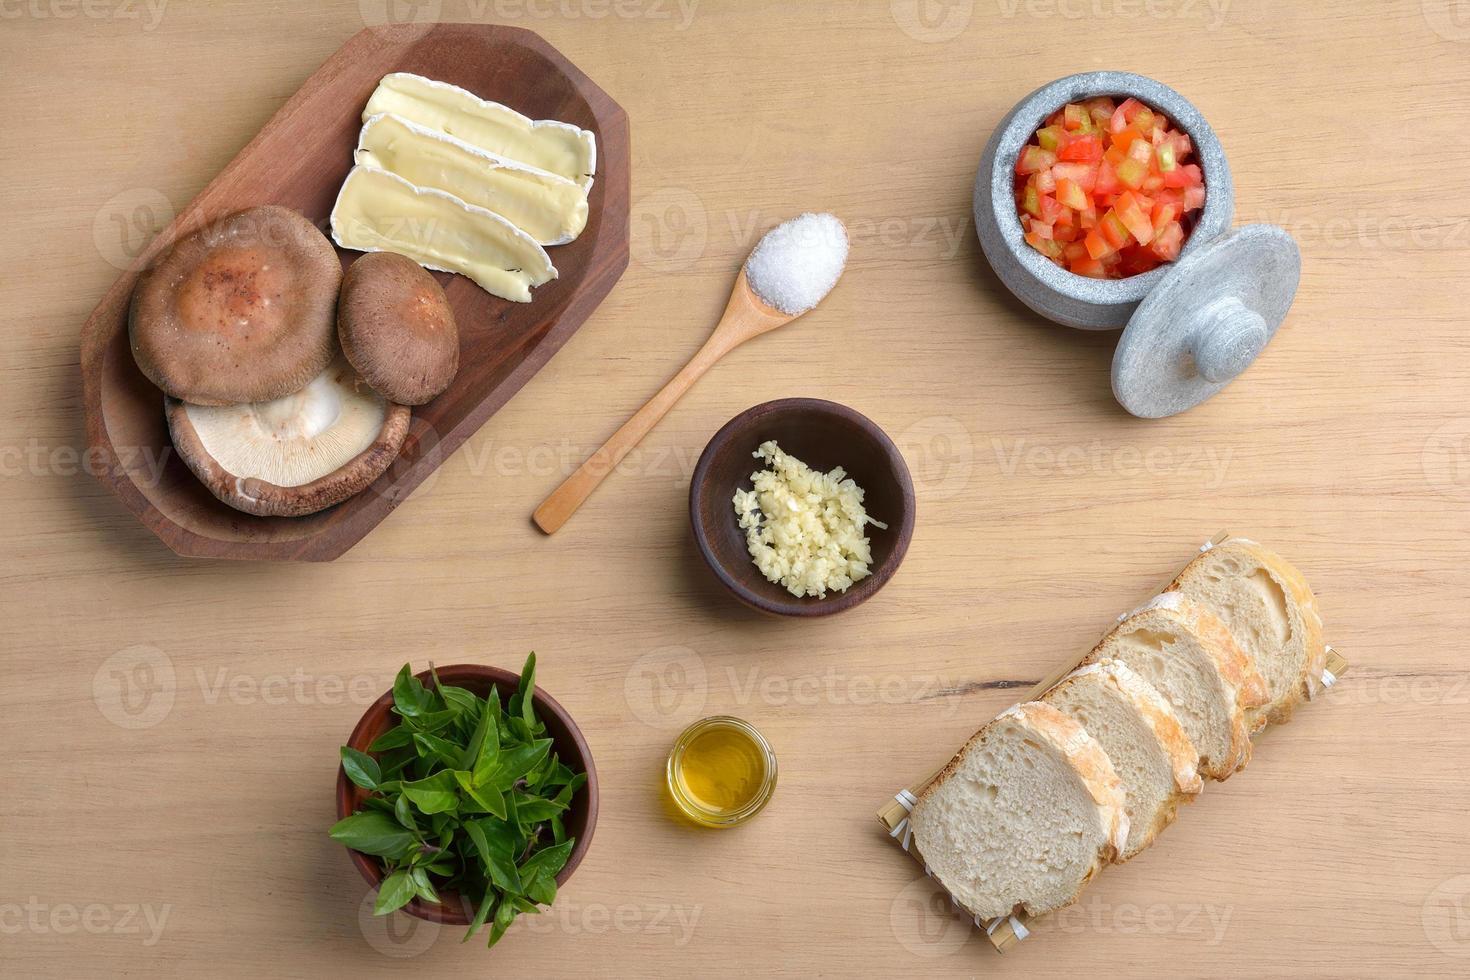 Basilic Tomato and Brie Shitake Mushroom Italian Bruschetta Mise photo